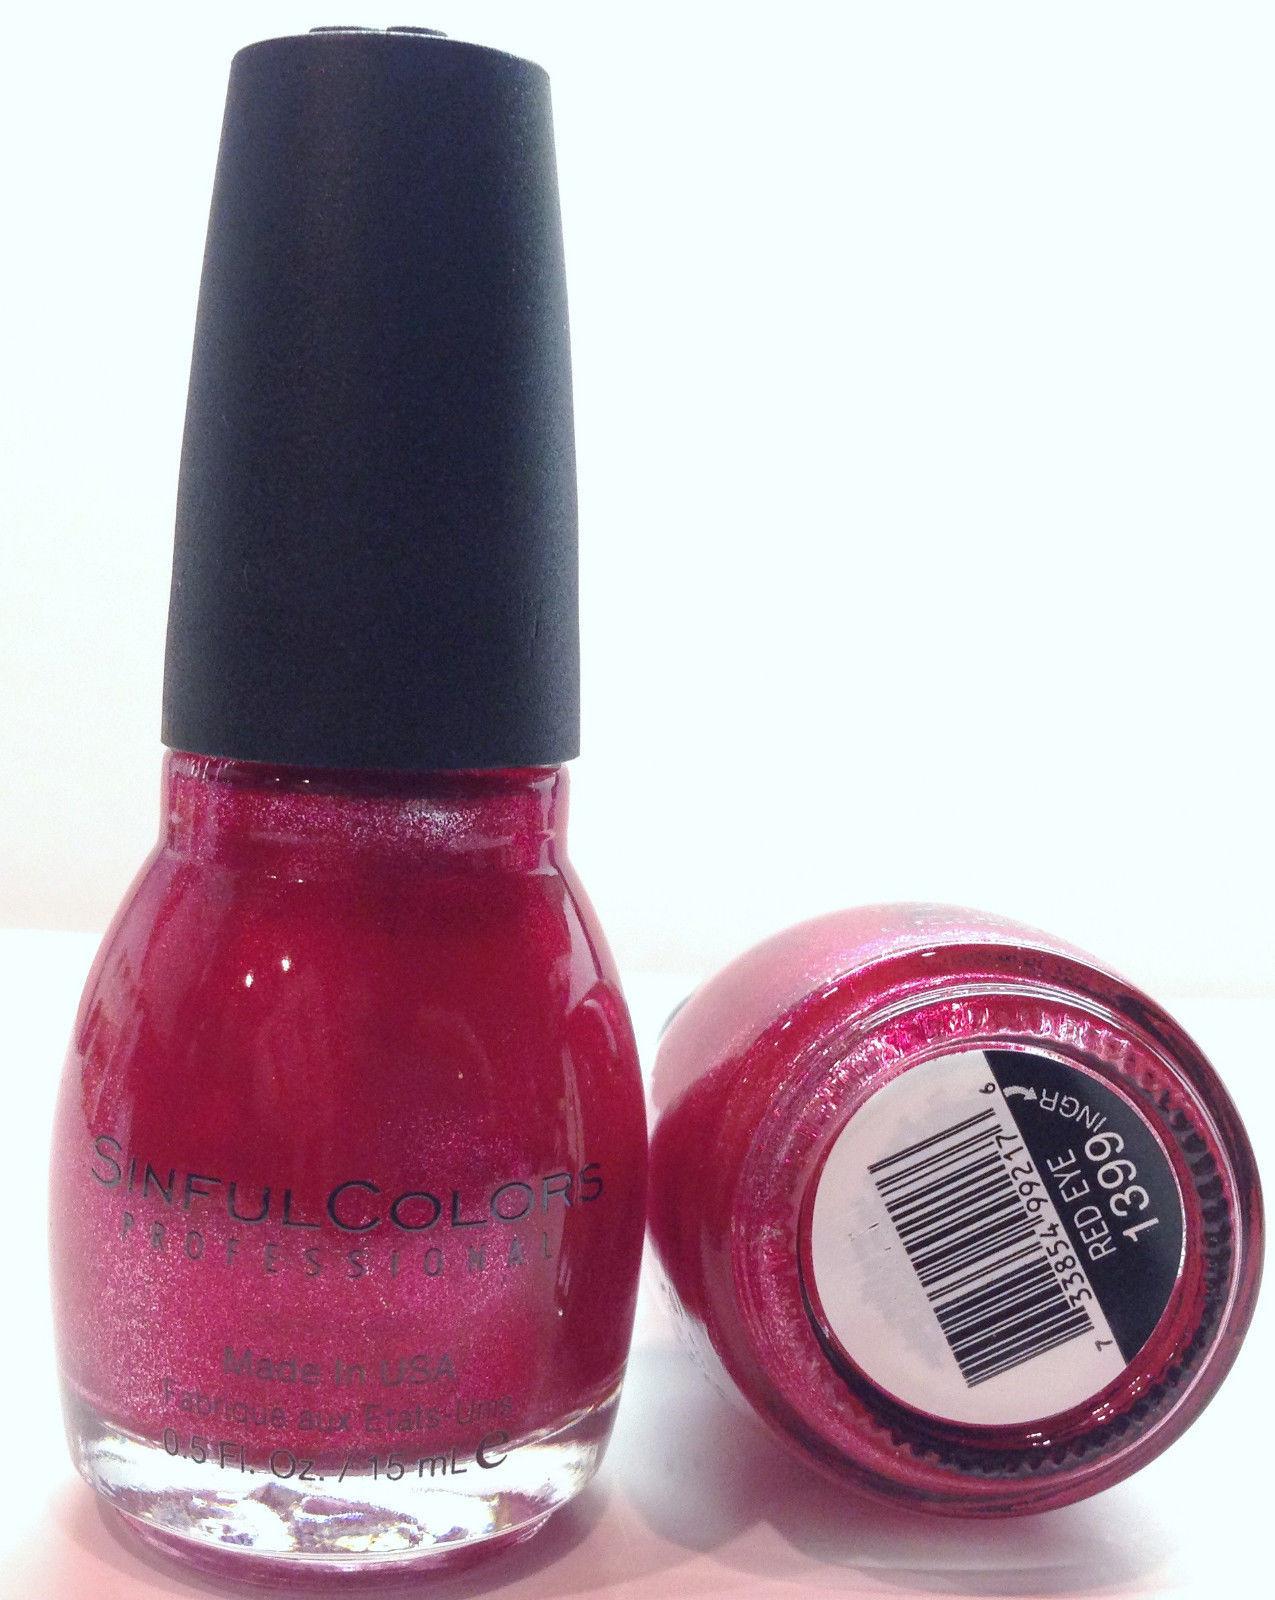 Sinful colors nail polish coupons - Neon museum las vegas coupons